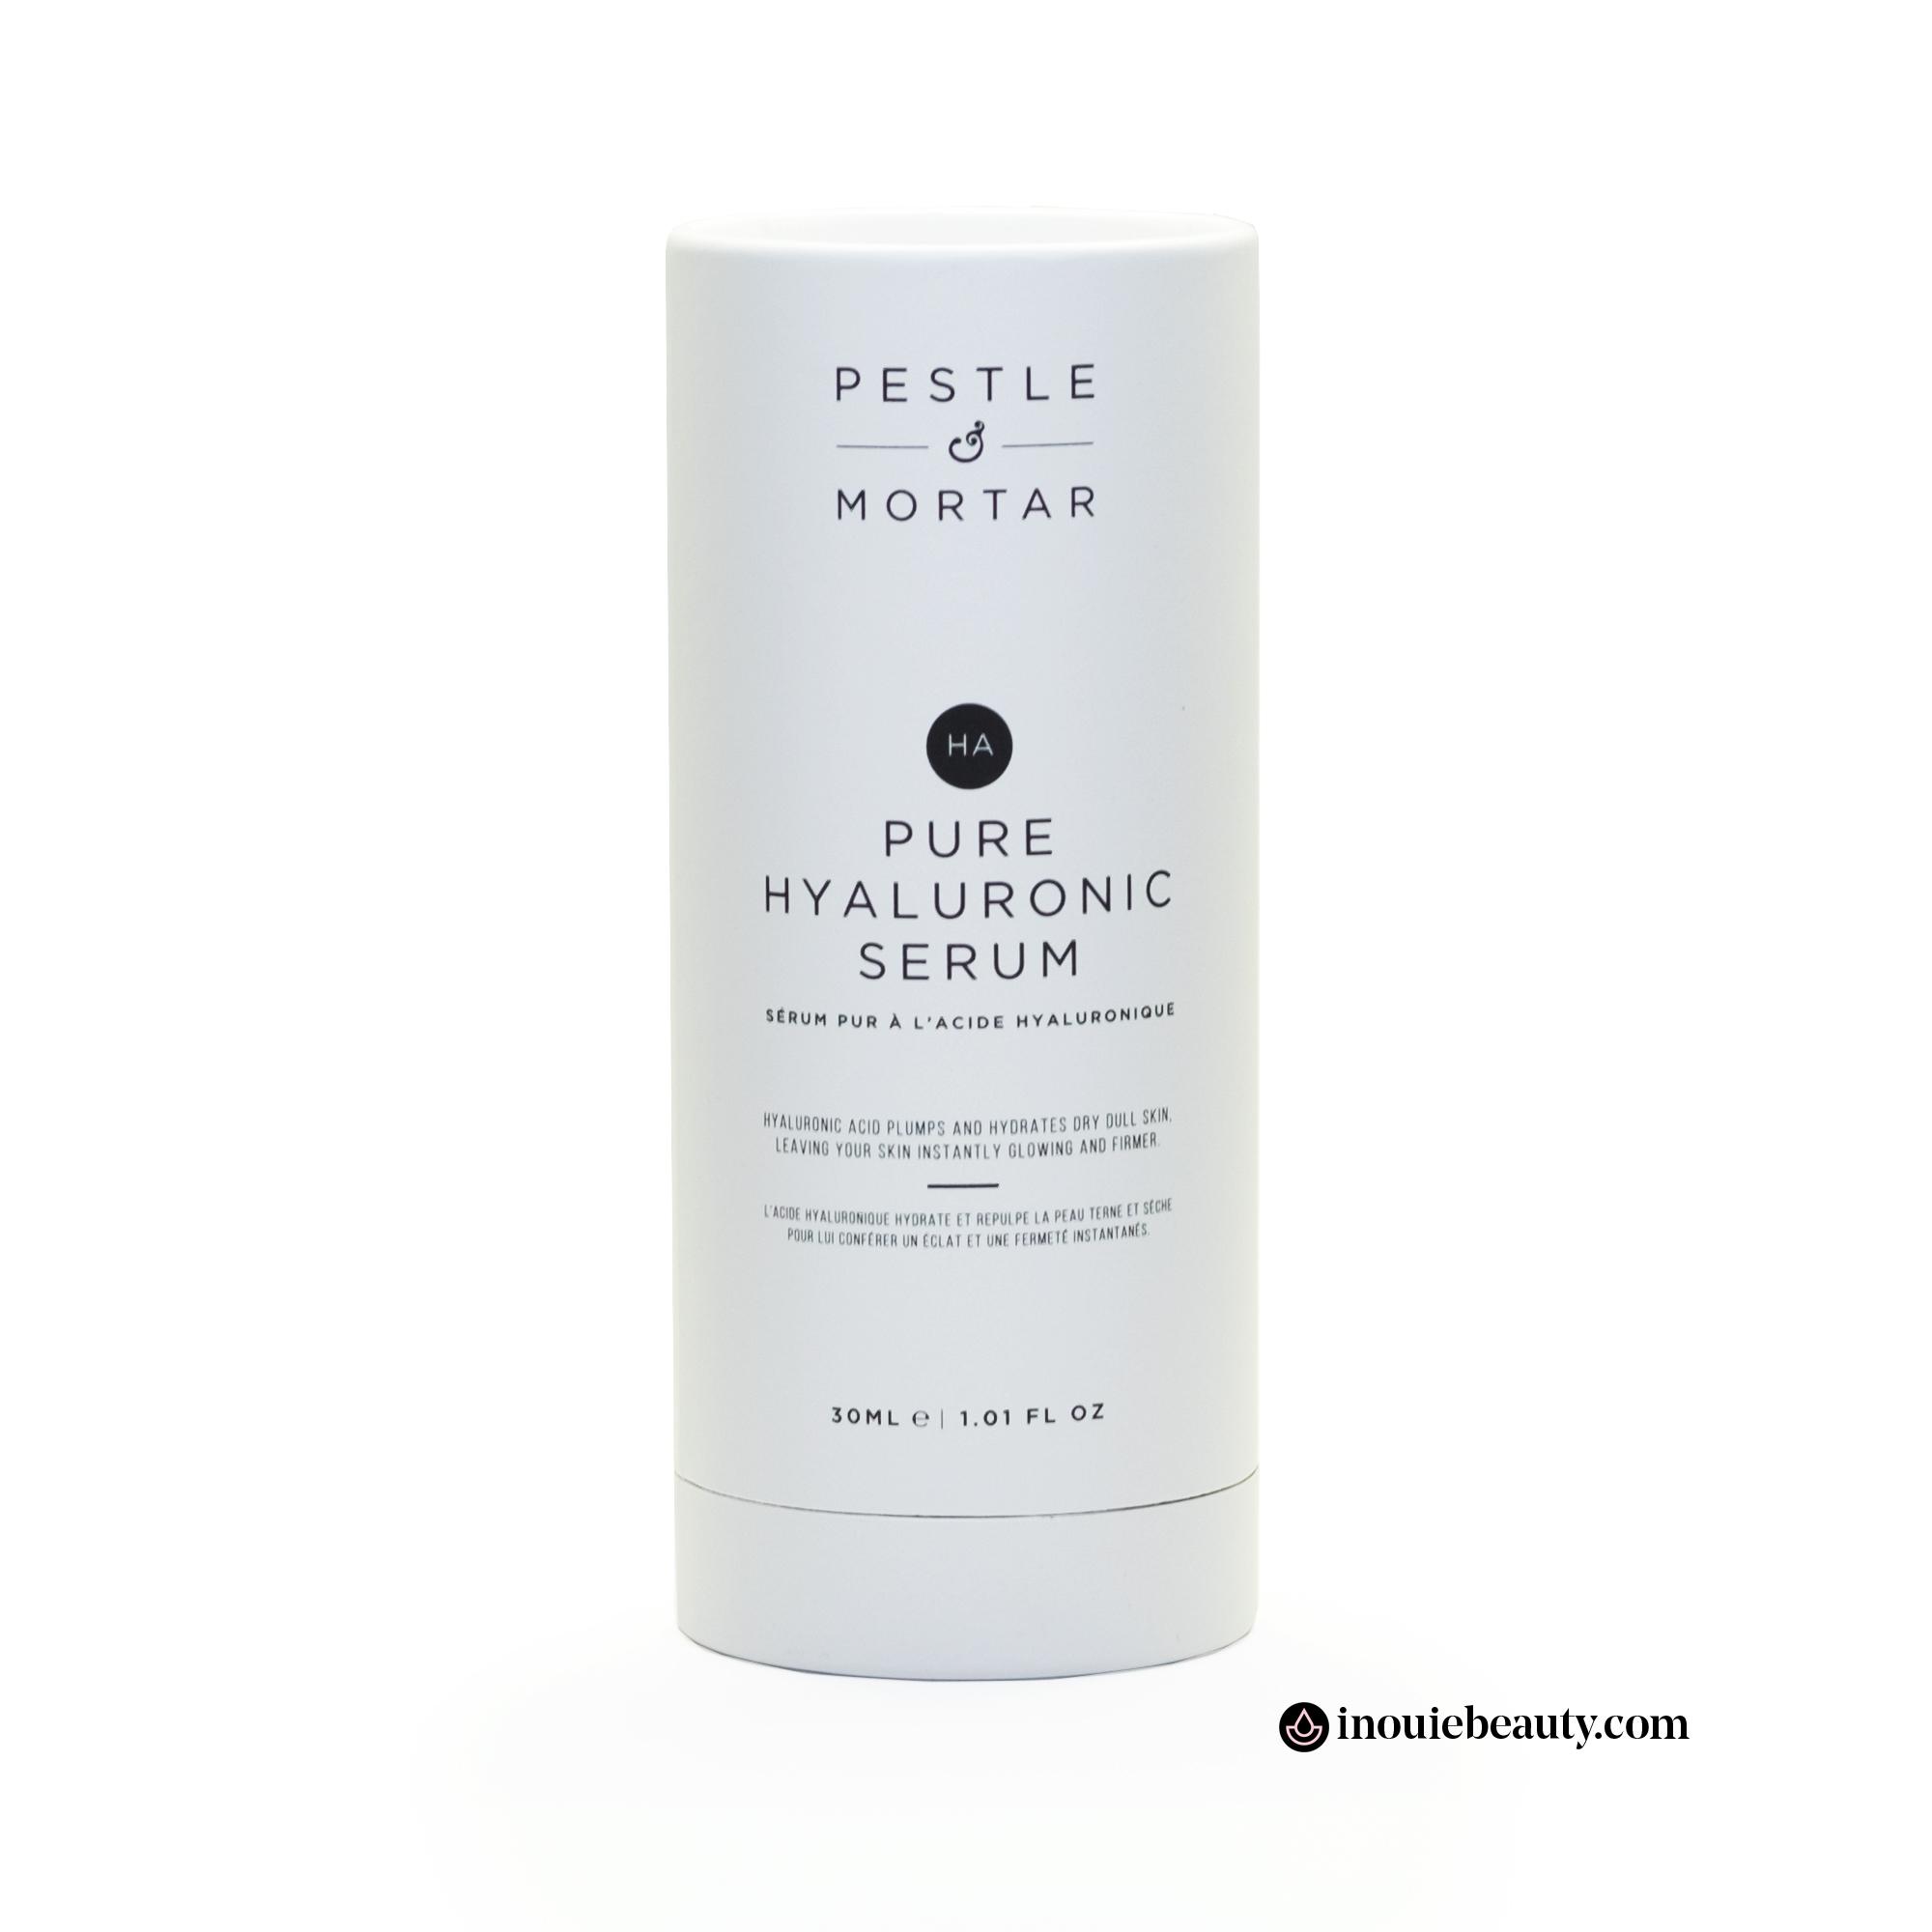 Pestle & Mortar Pure Hyaluronic Serum